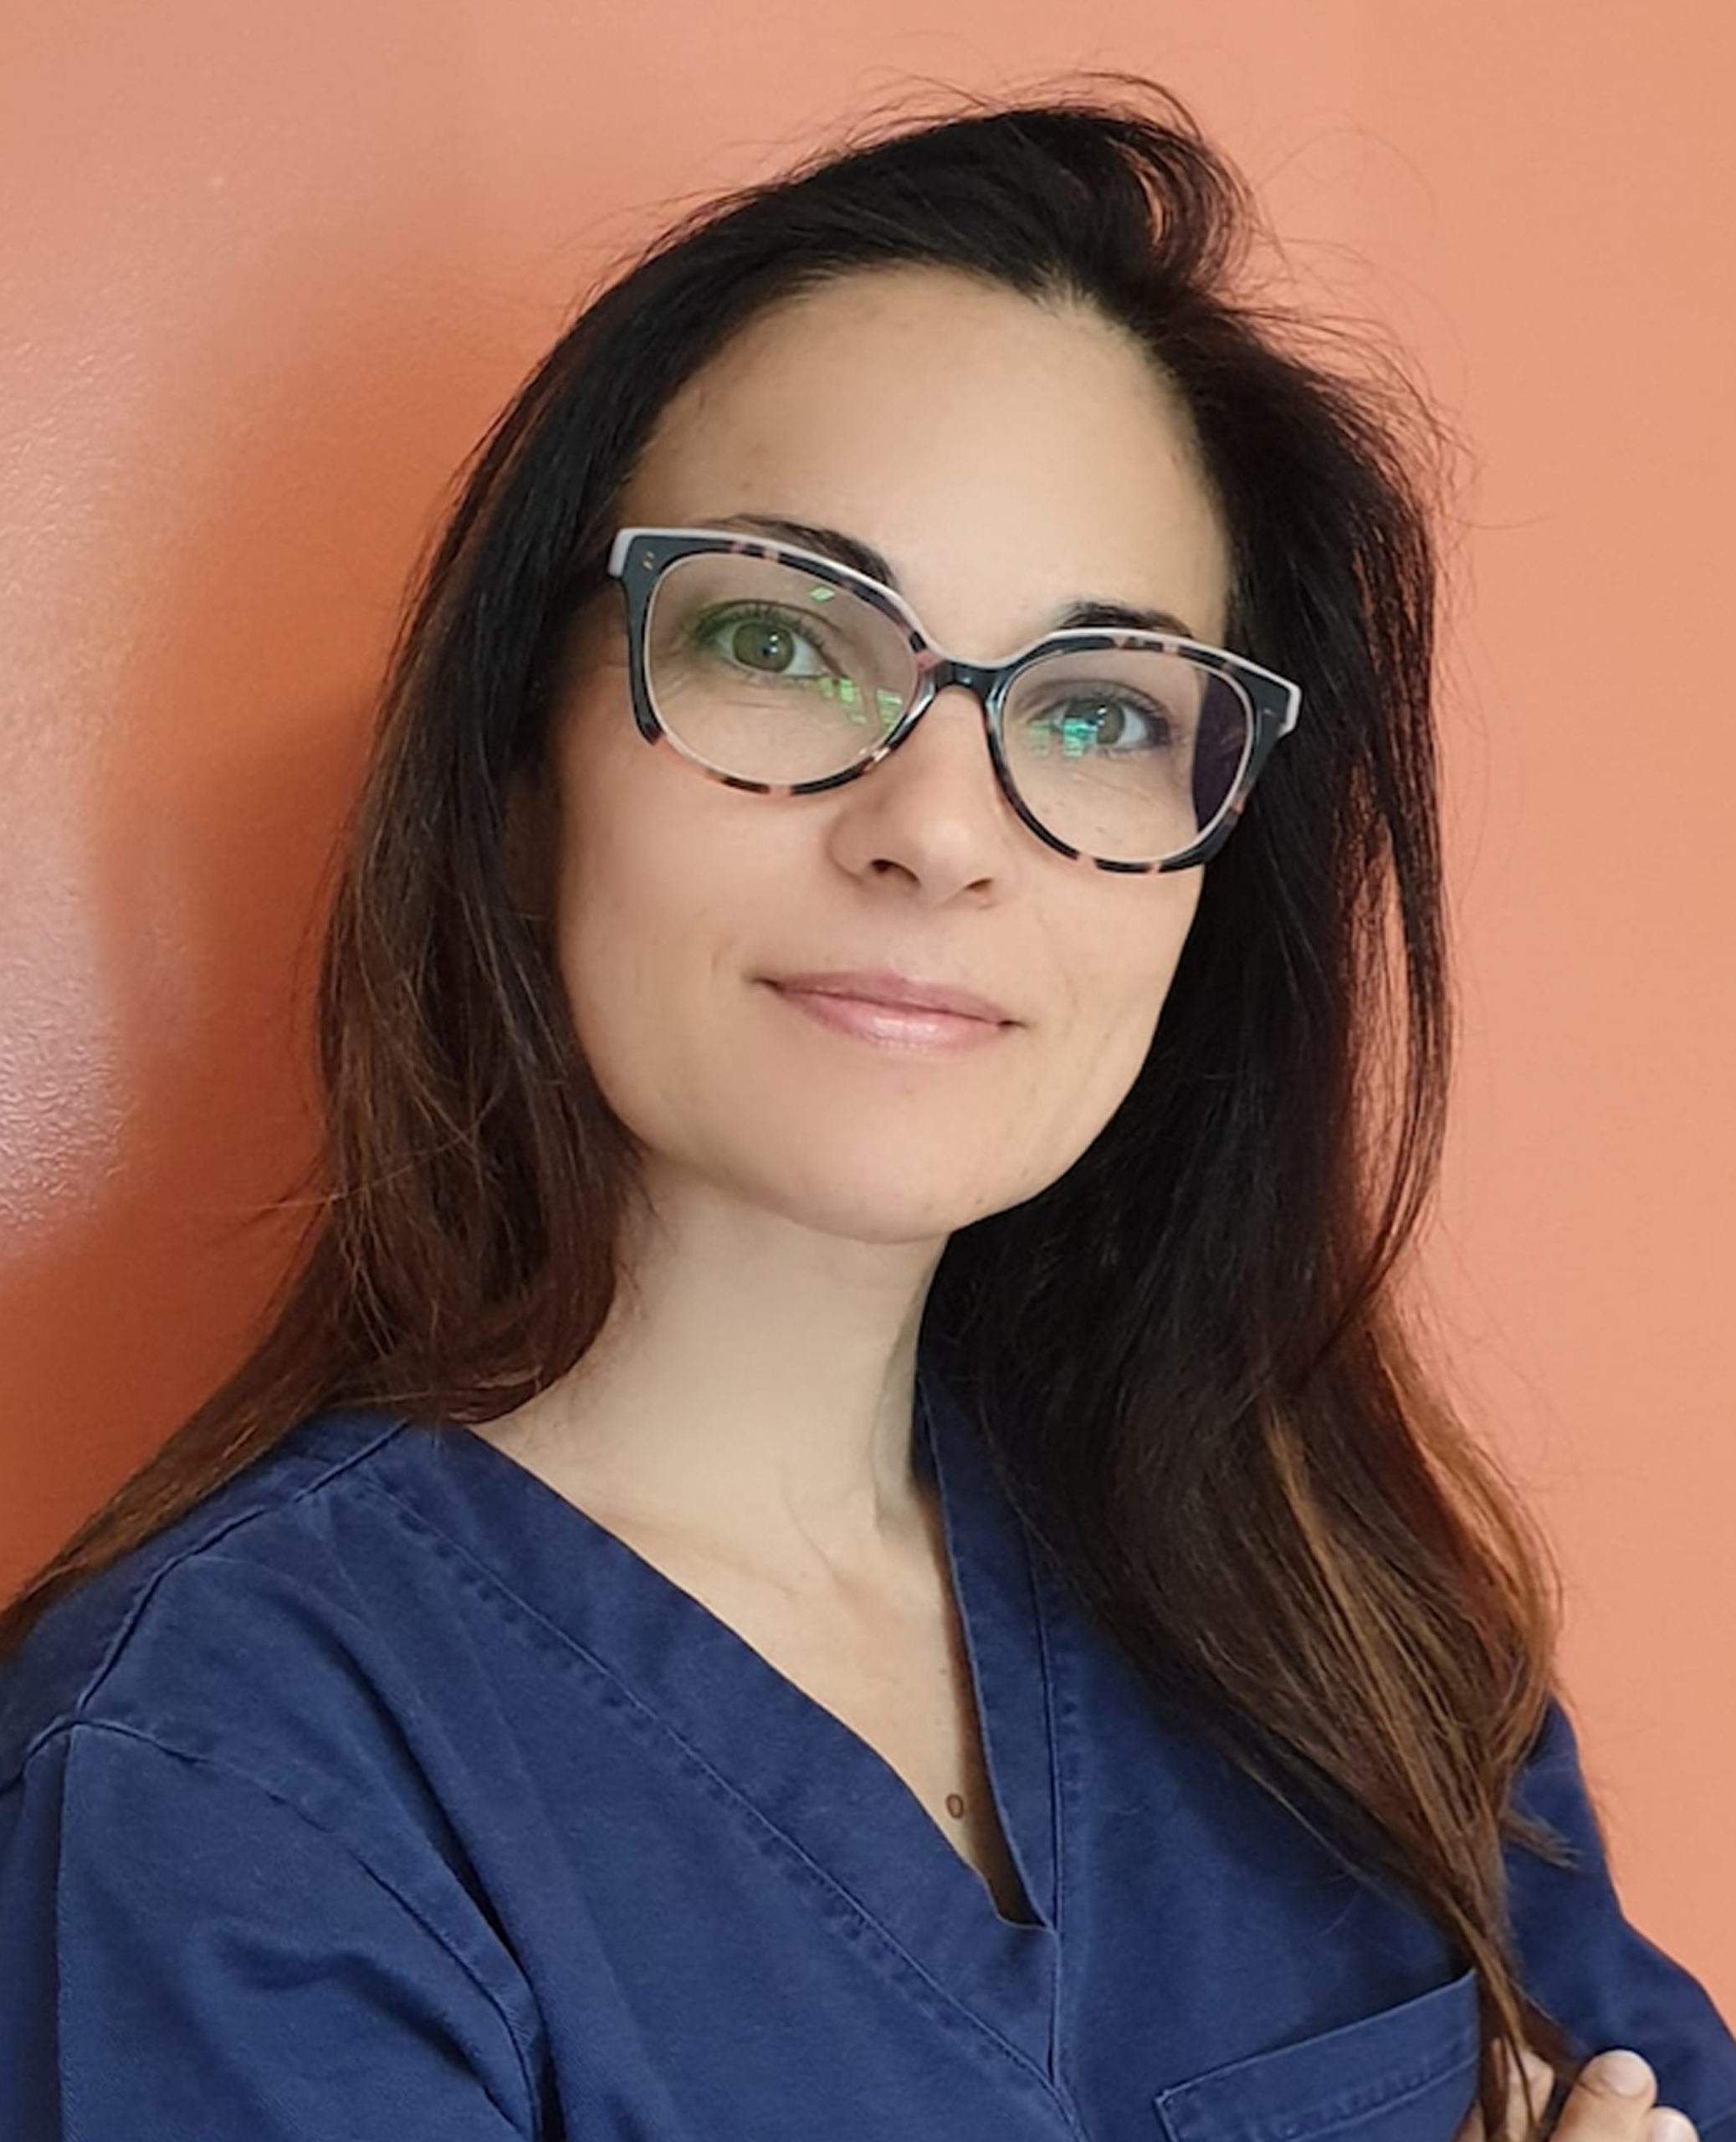 Dott.ssa Maria Lina Mura